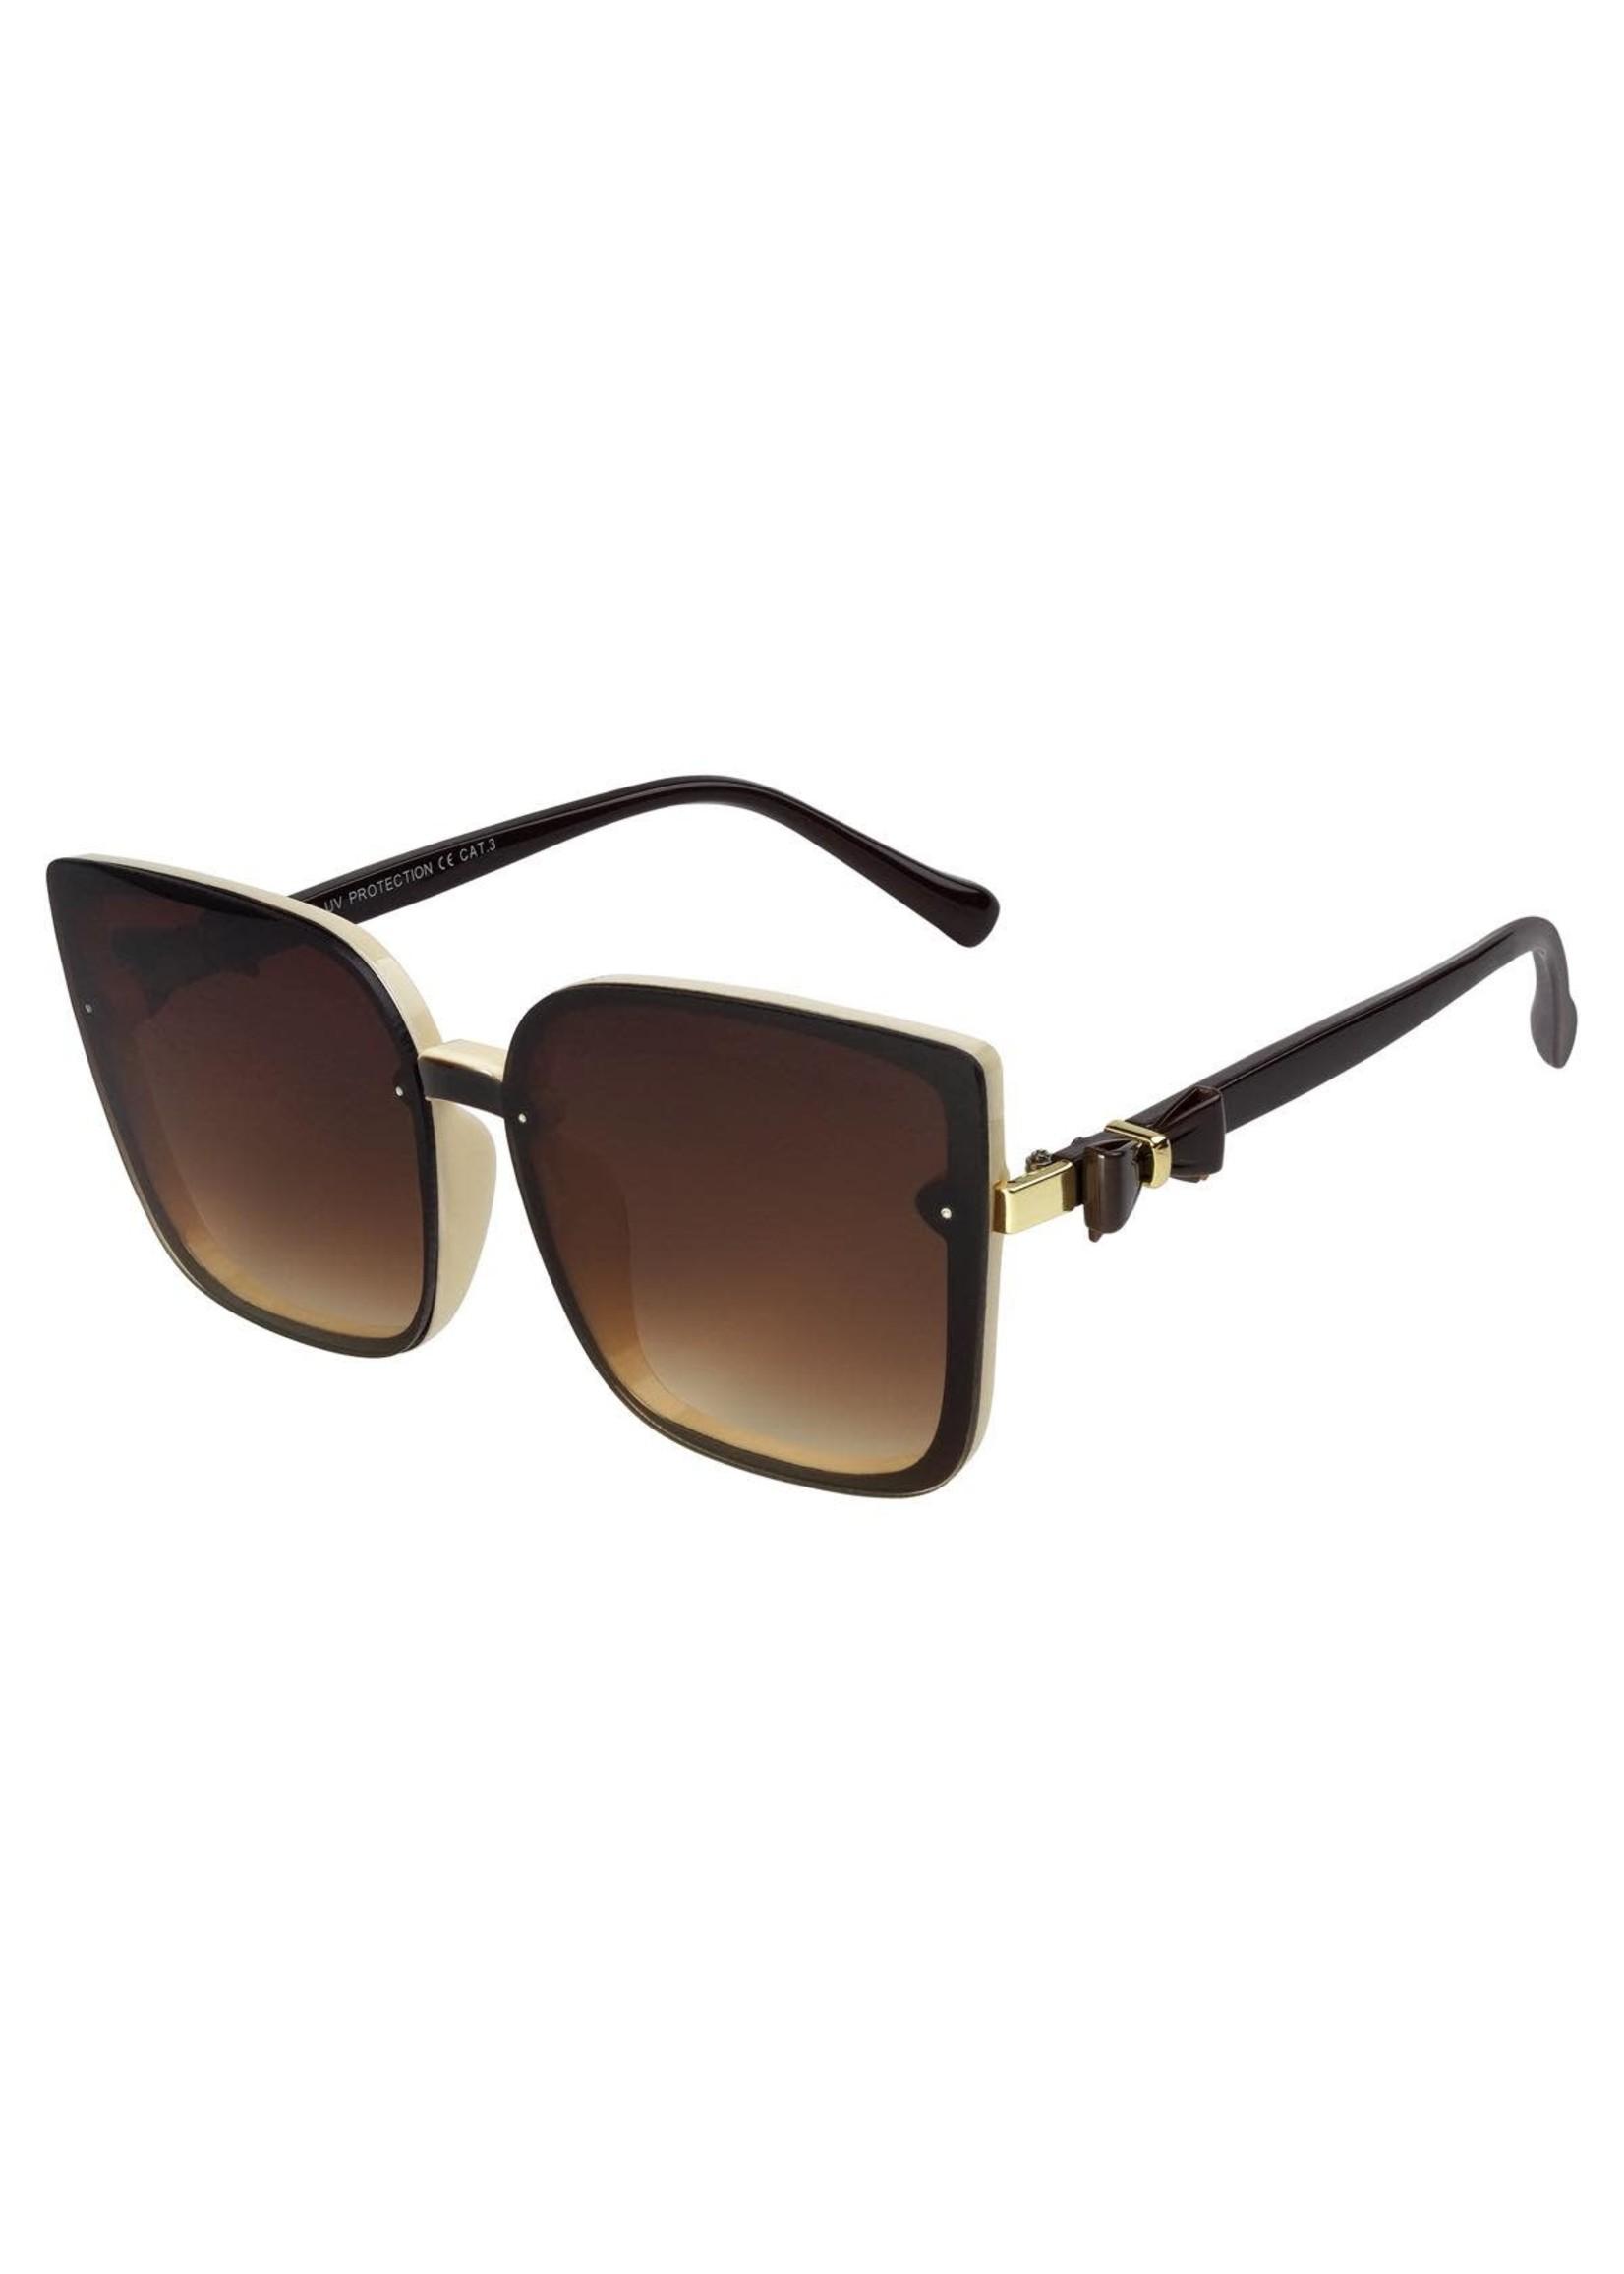 Milaan Sunglasses Bow Beige